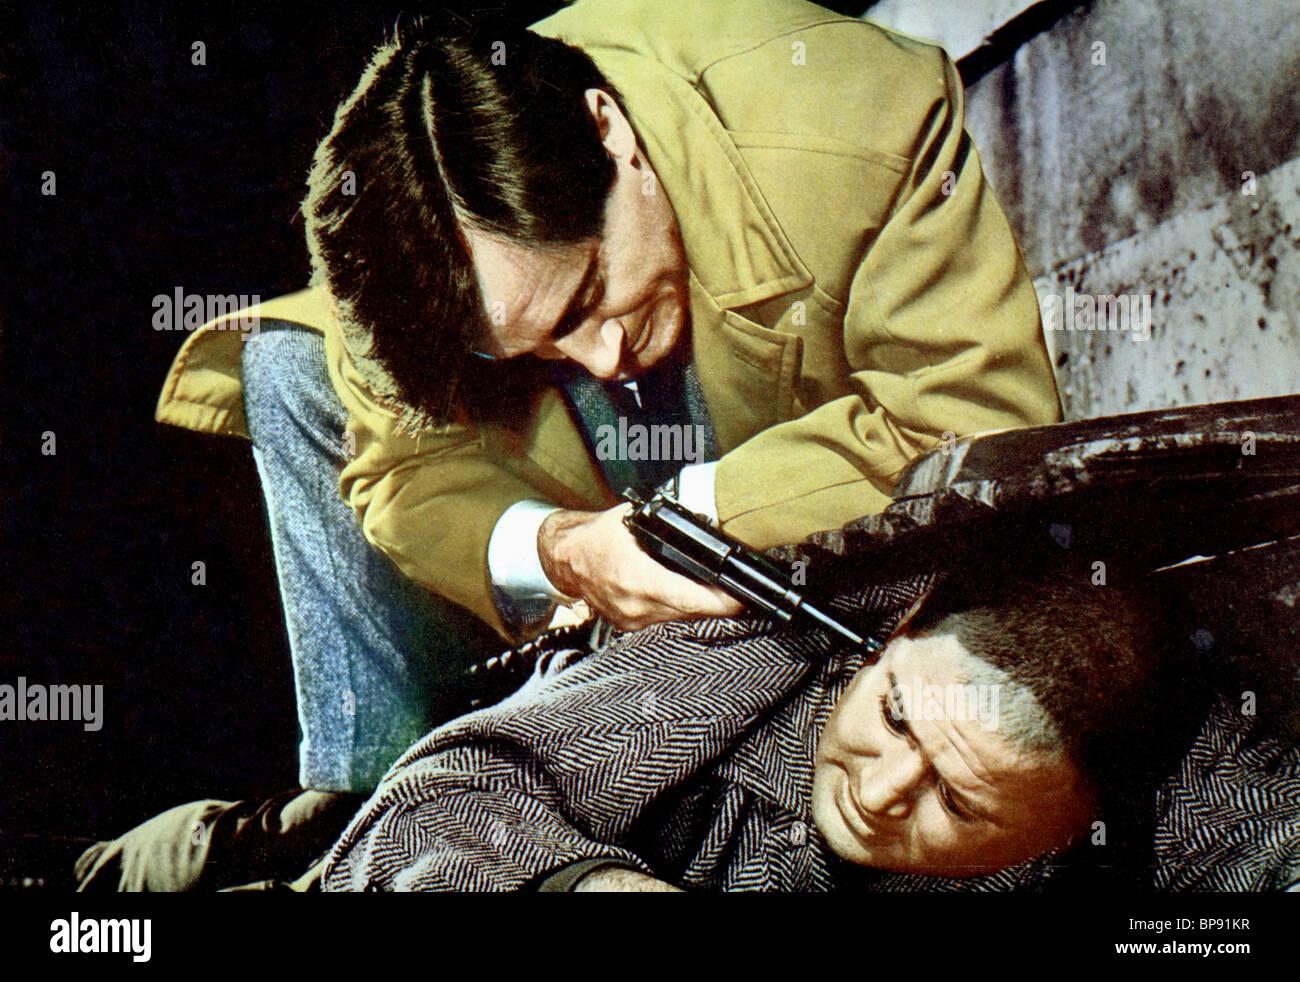 SZENE MIT ROBERT VAUGHN DIE VENEZIANISCHE AFFÄRE (1967) Stockbild